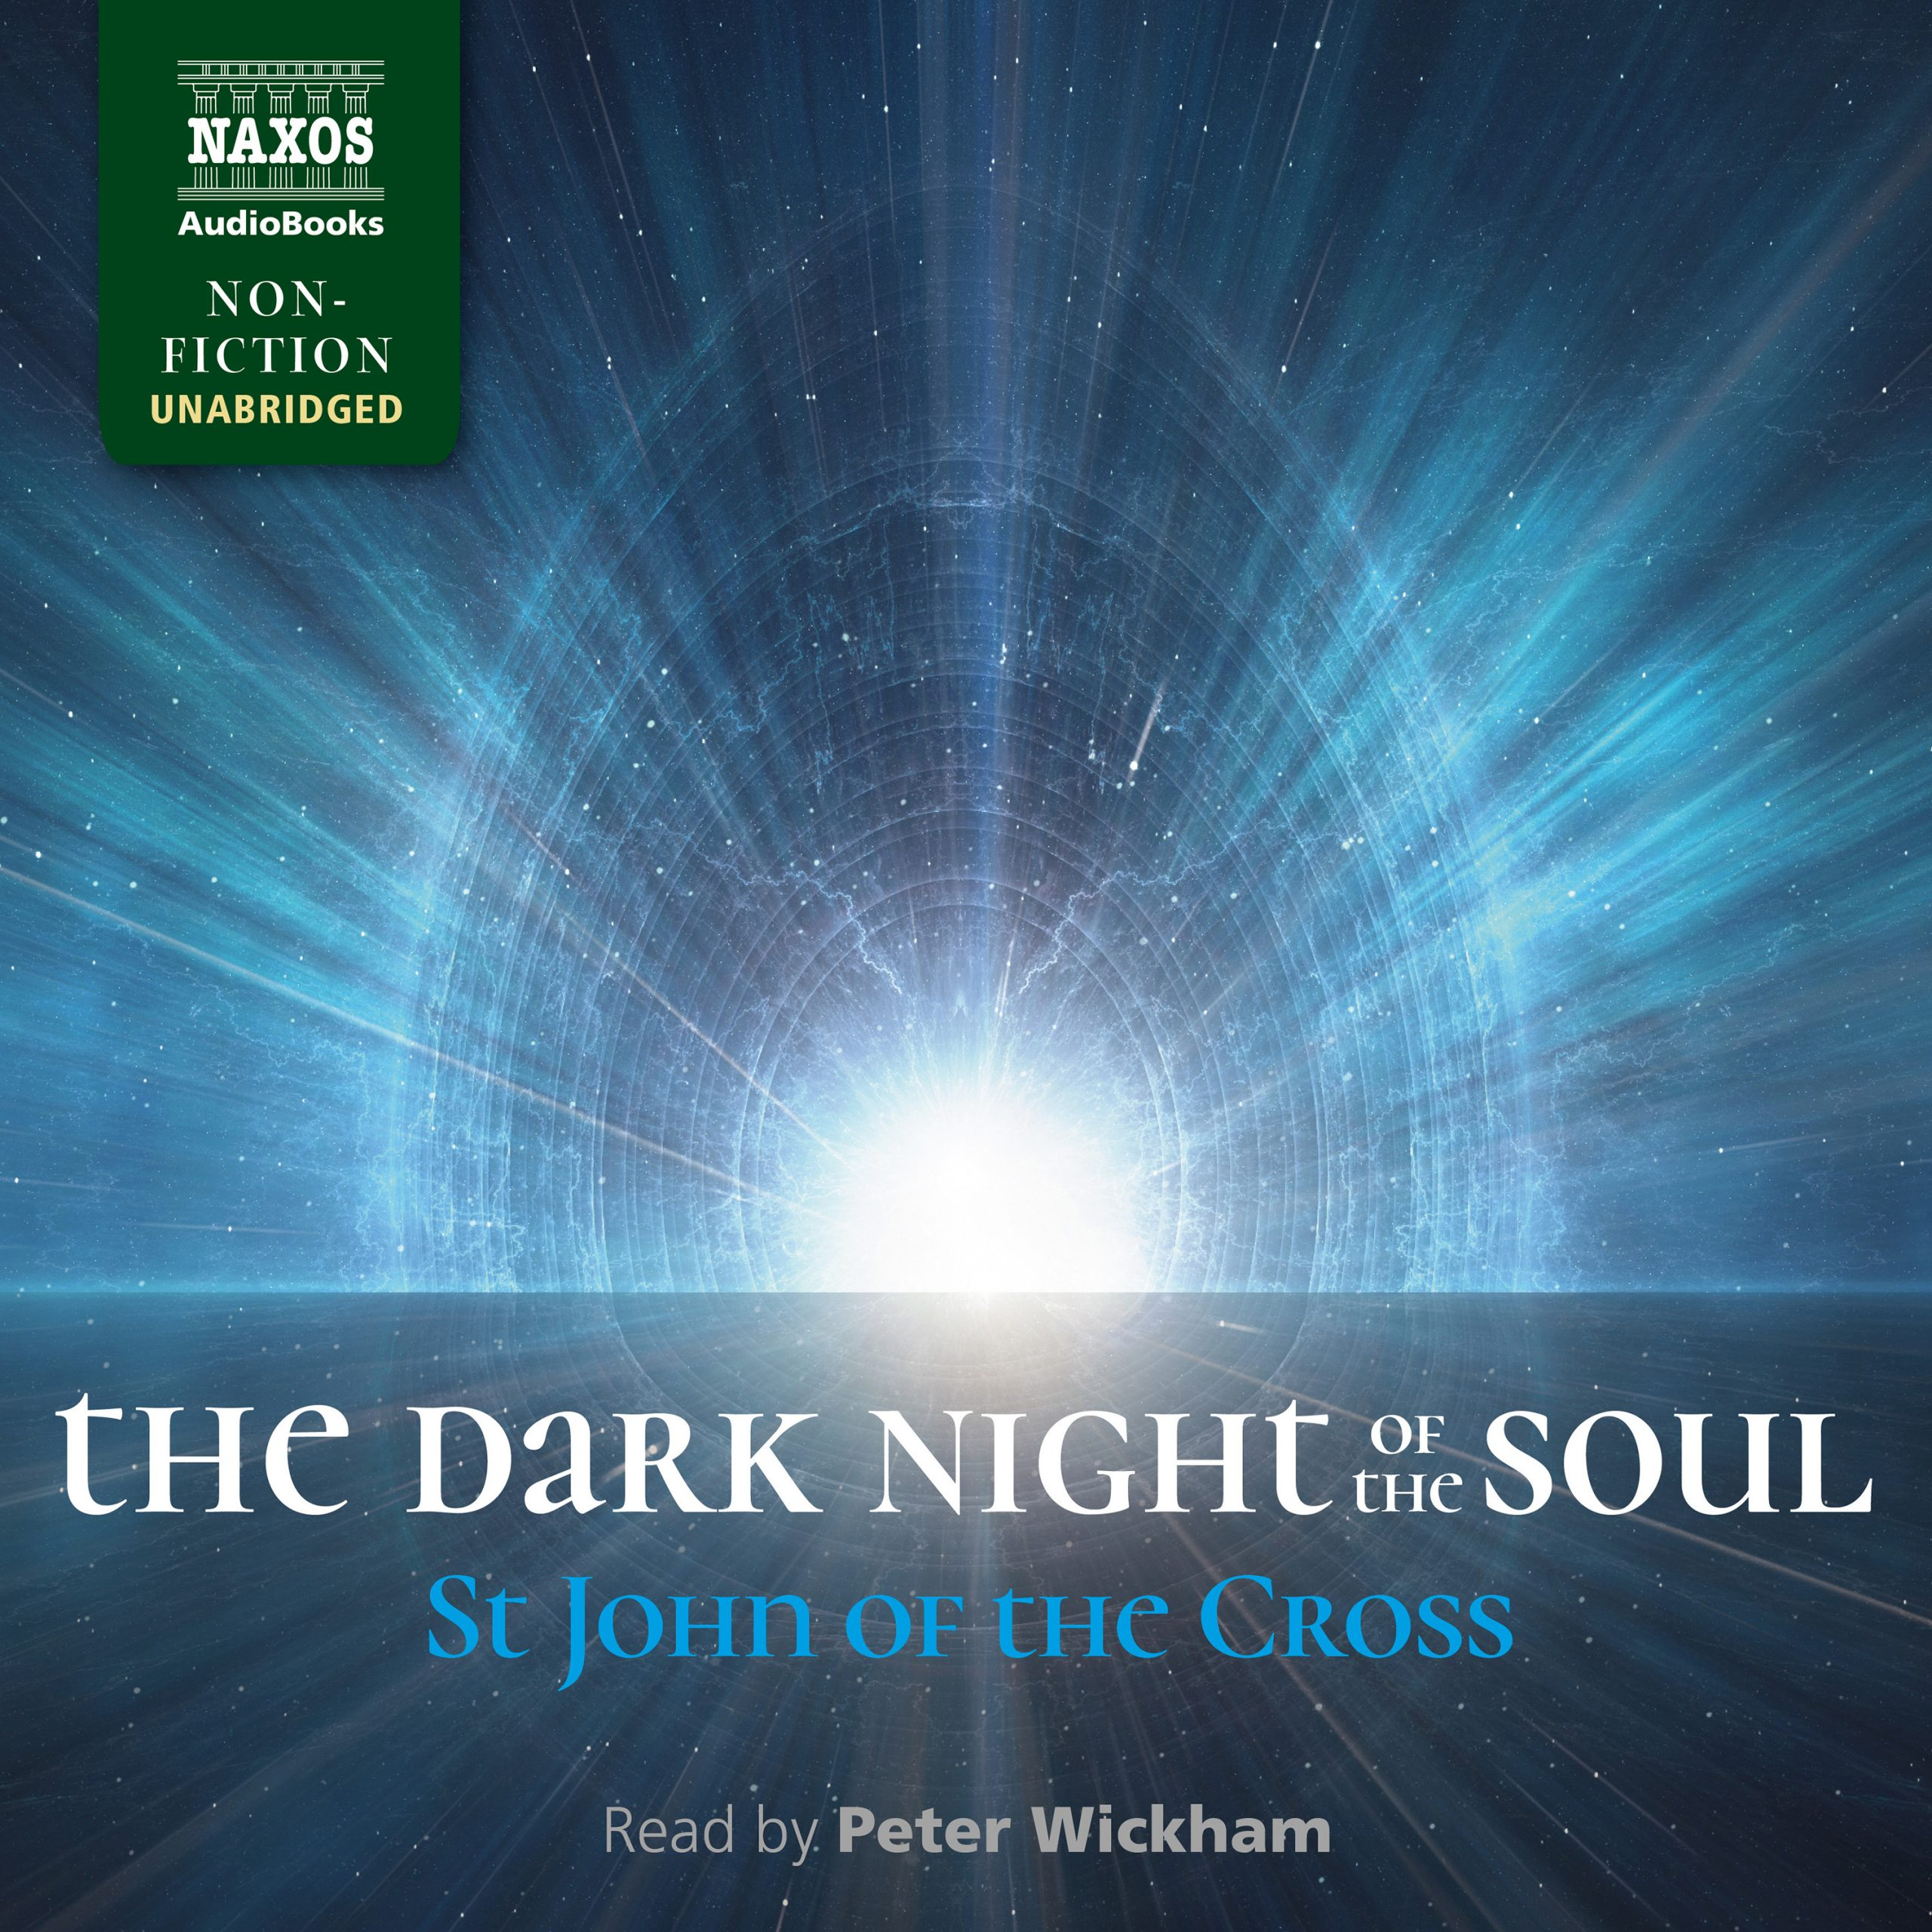 The Dark Night of the Soul (unabridged)